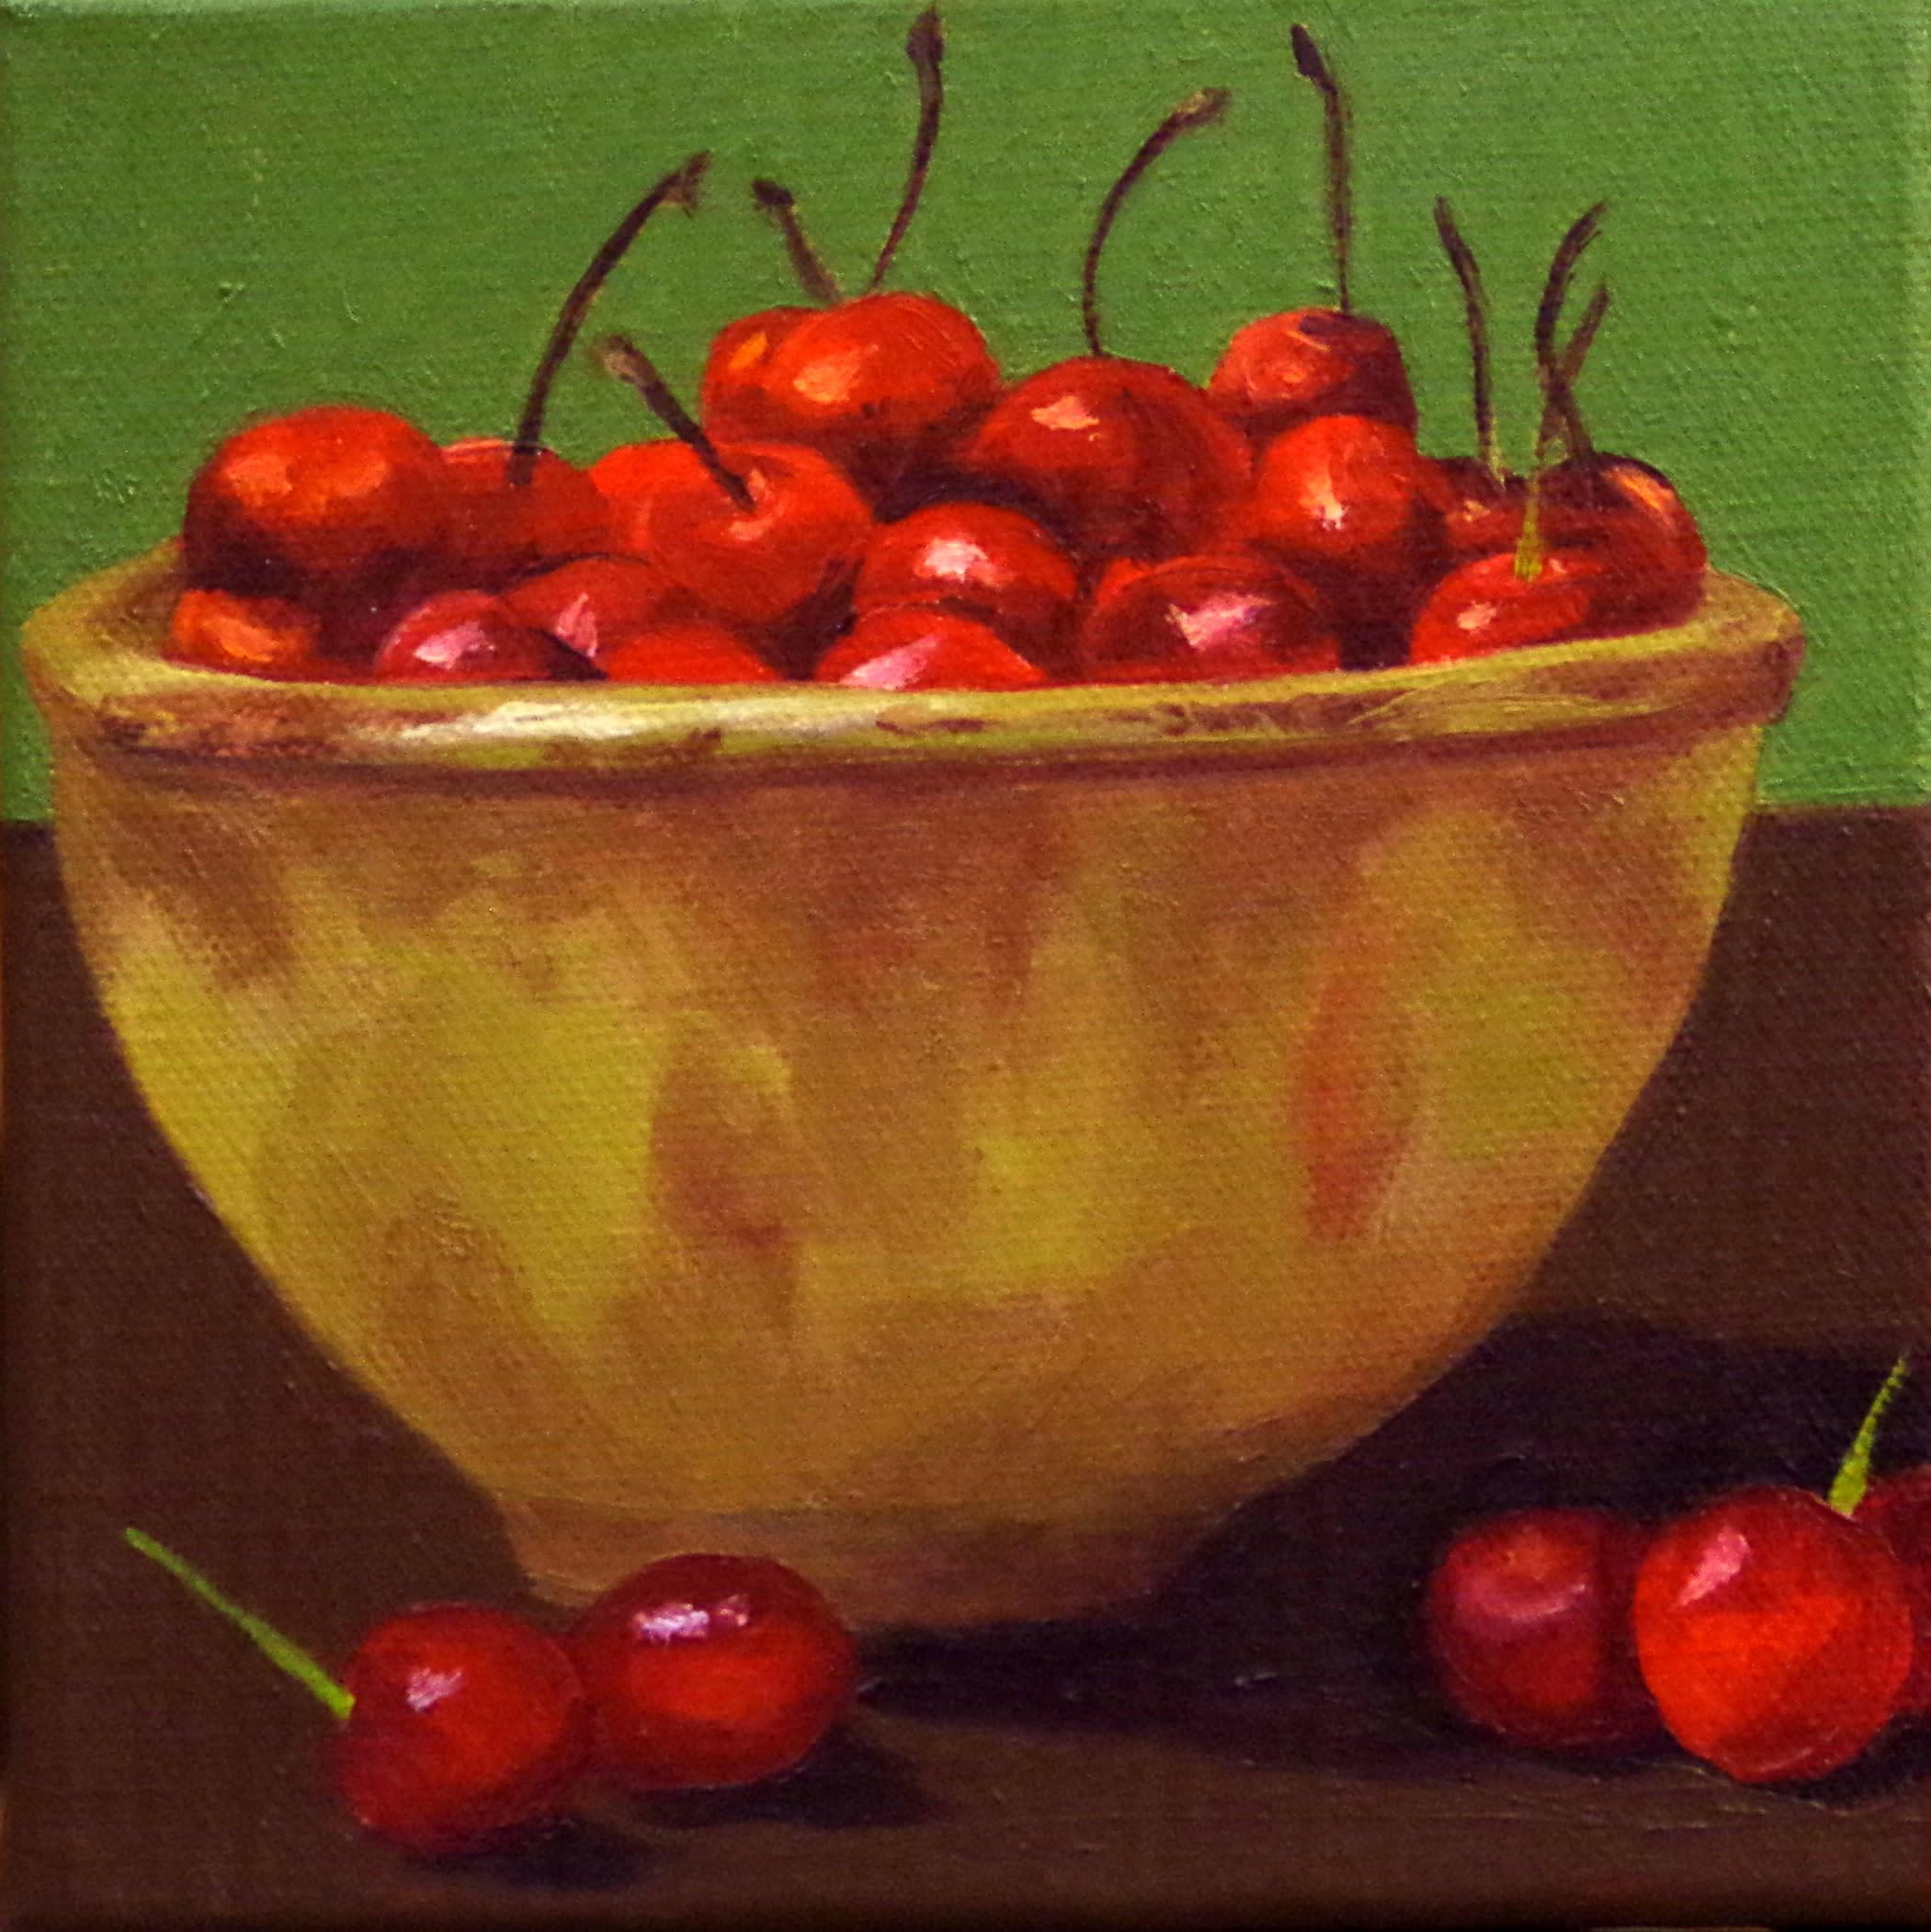 Cherries in clair s bowl tw5fm4